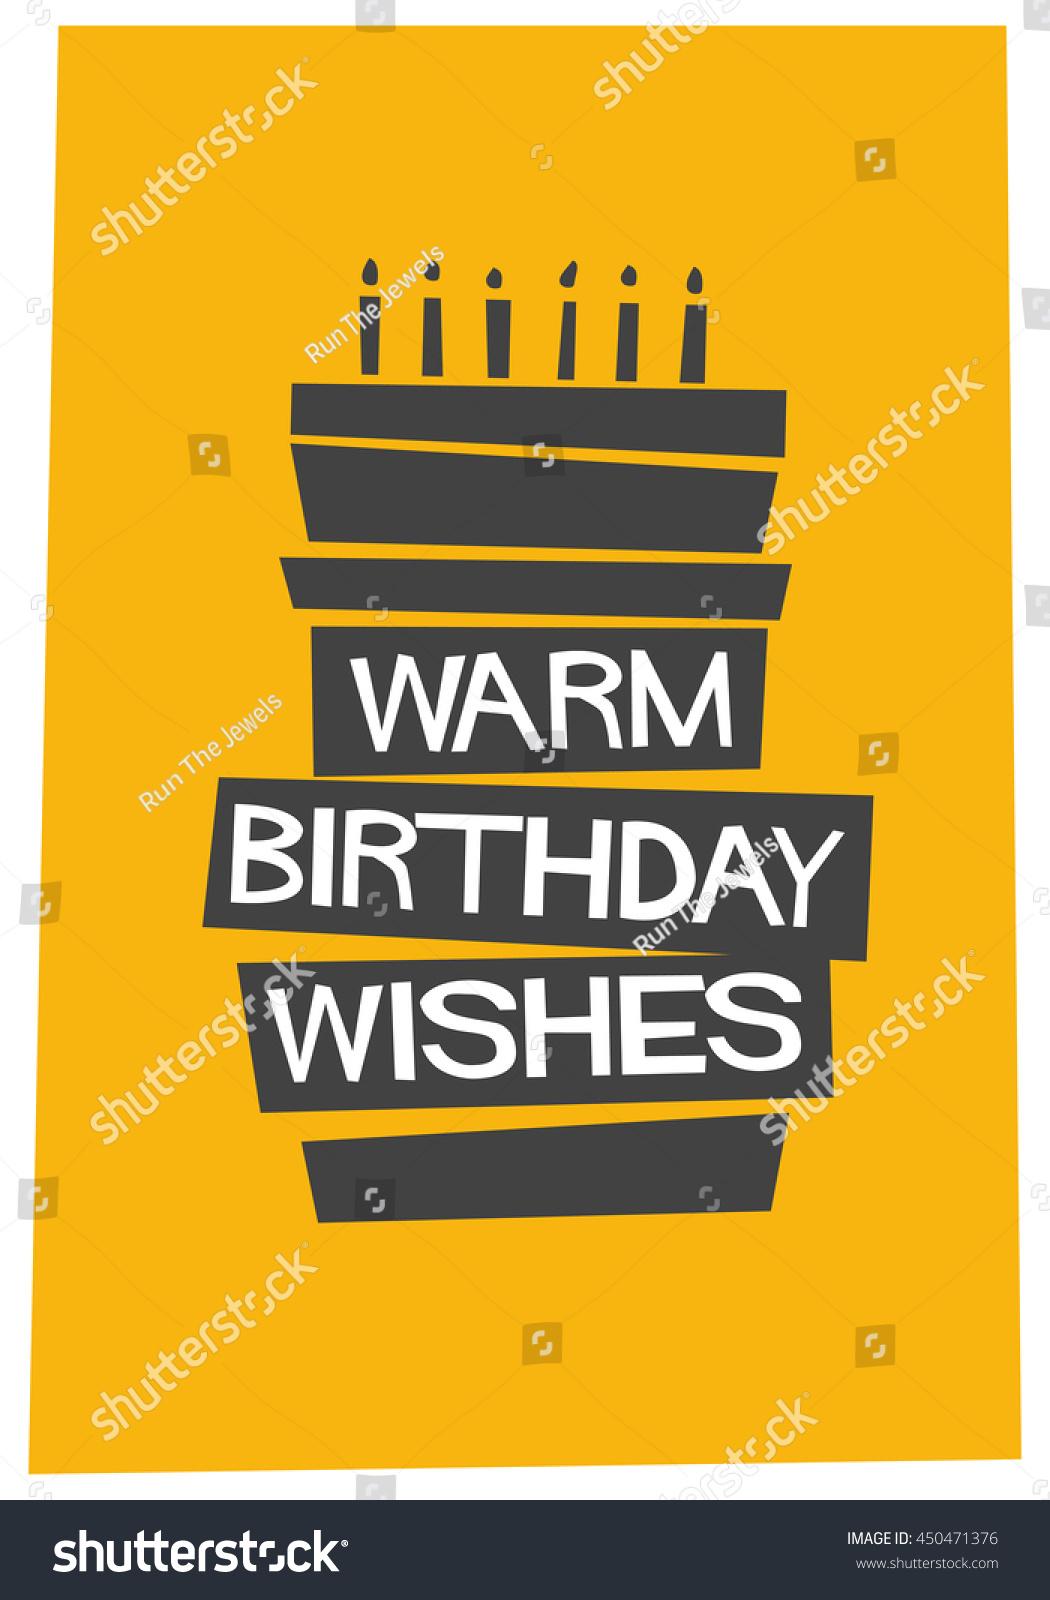 Warm Birthday Wishes Written On Cake Stock Vector 2018 450471376